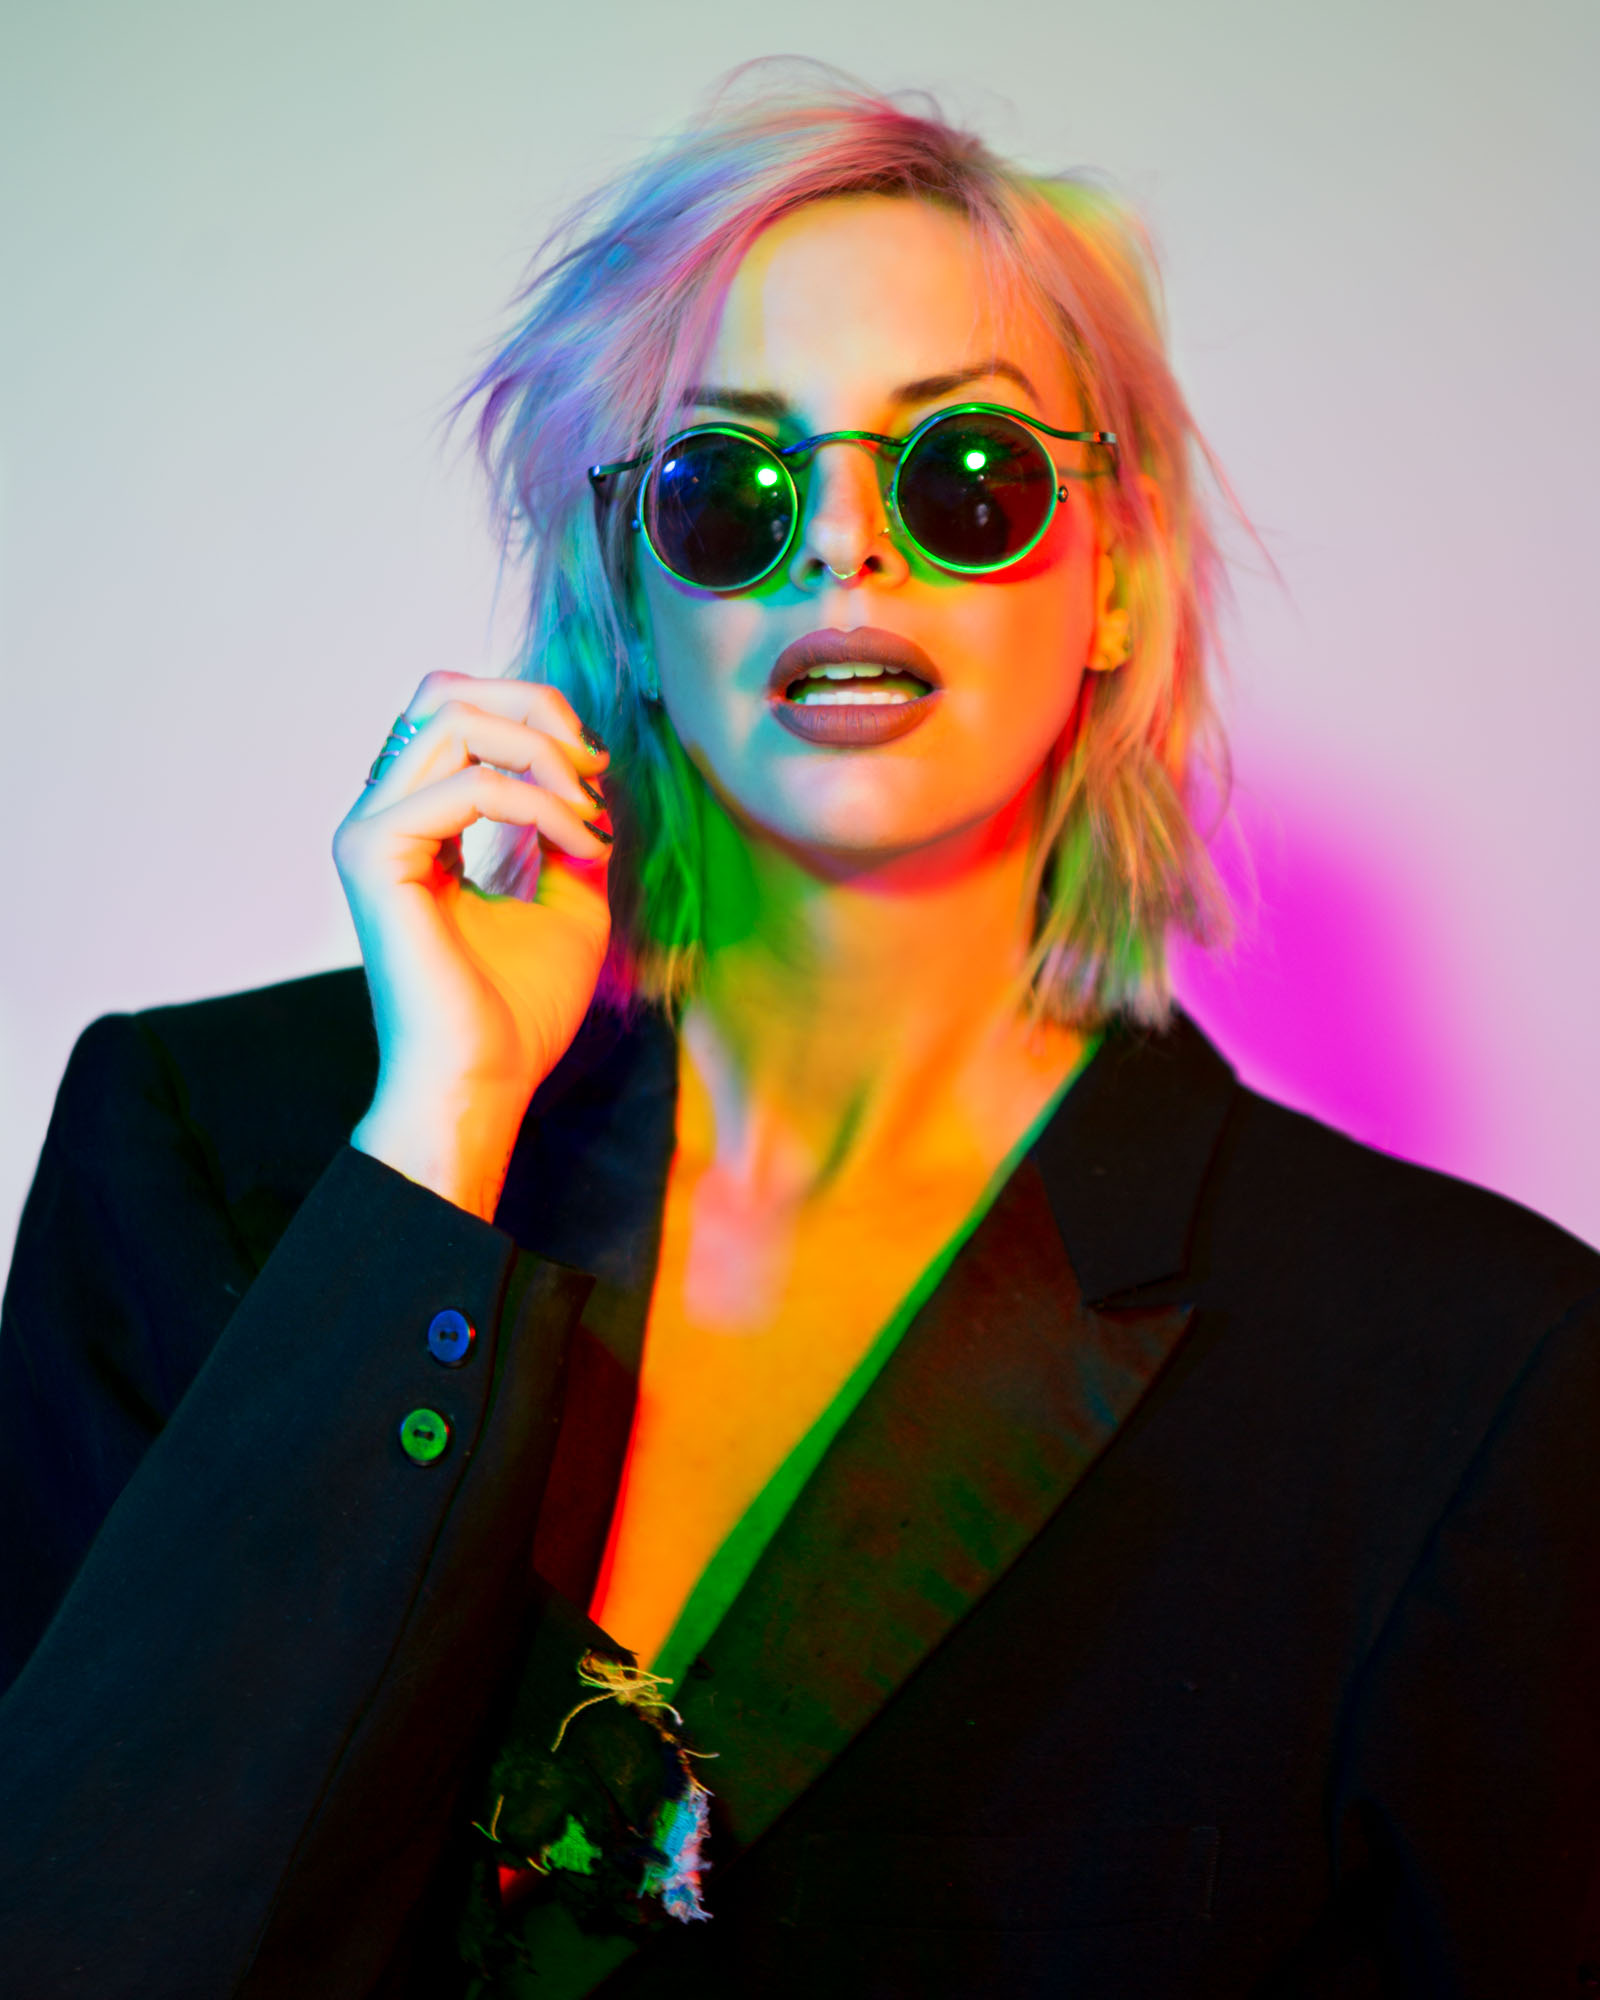 Matt_Doheny_Los_Angeles_Fashion_Portrati_Commercial_Photographer-22.jpg